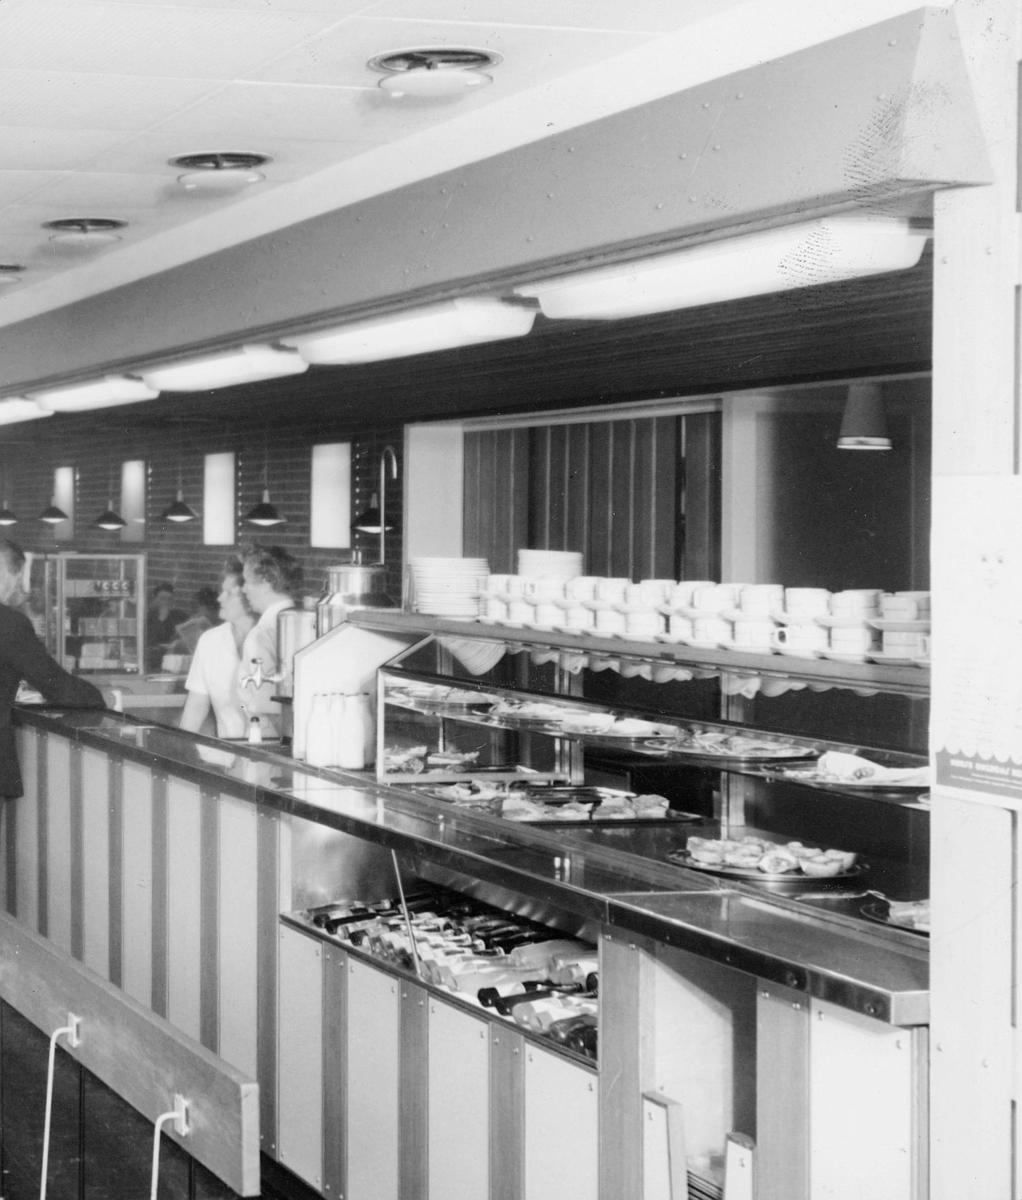 spisemesser, interiør, kantinepersonell, bak smørbrøddisken